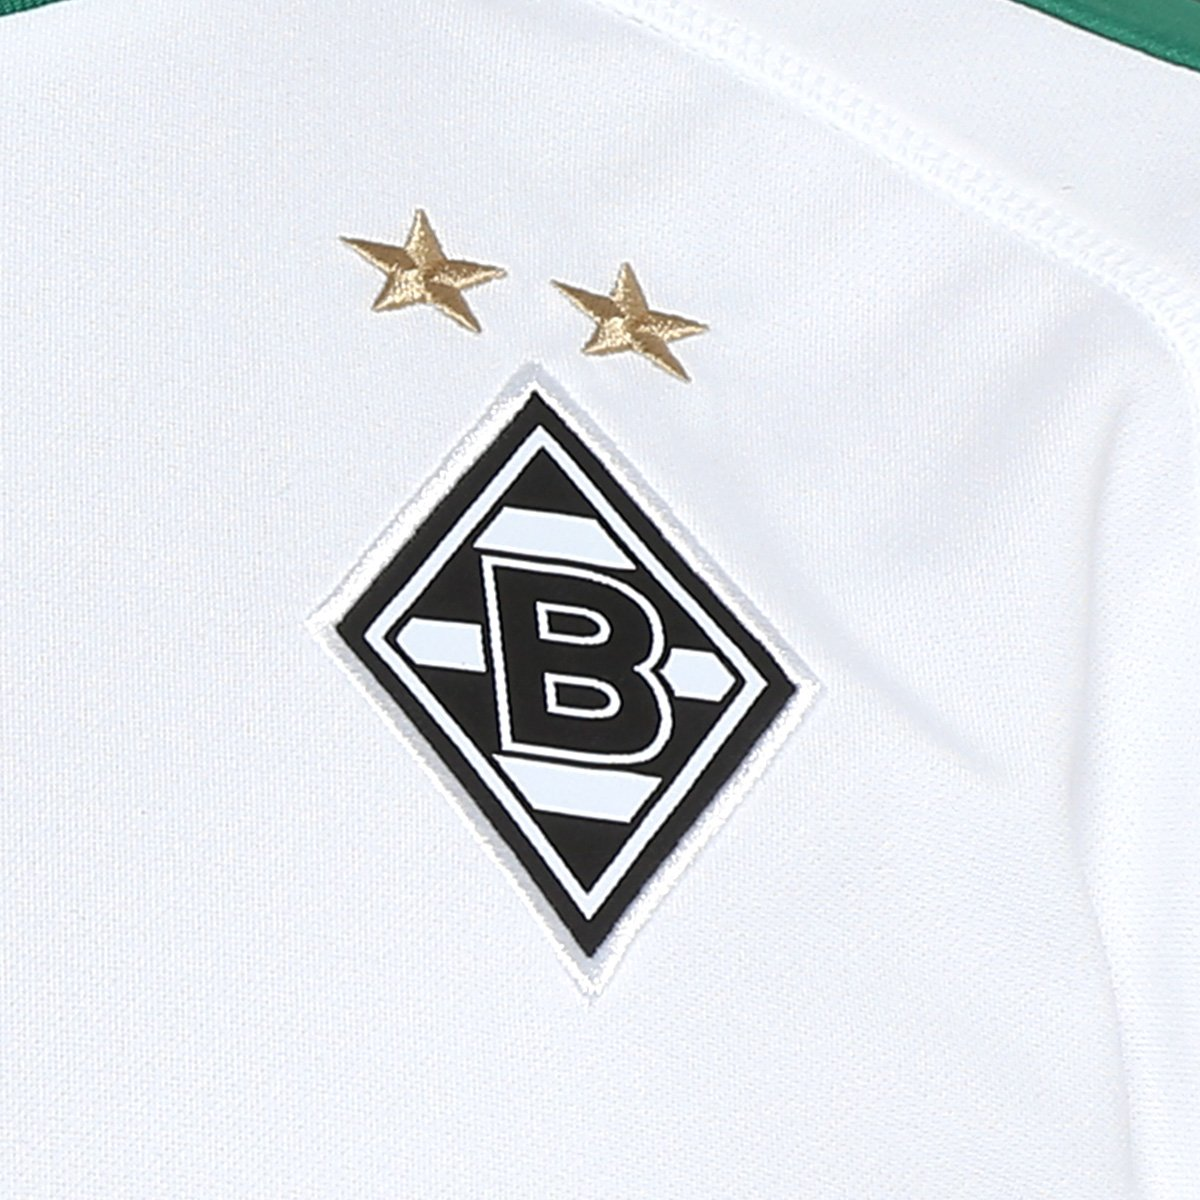 ... Camisa Borussia Mönchengladbach Réplica Sponsor Puma Masculina ... 29d83e99227fc